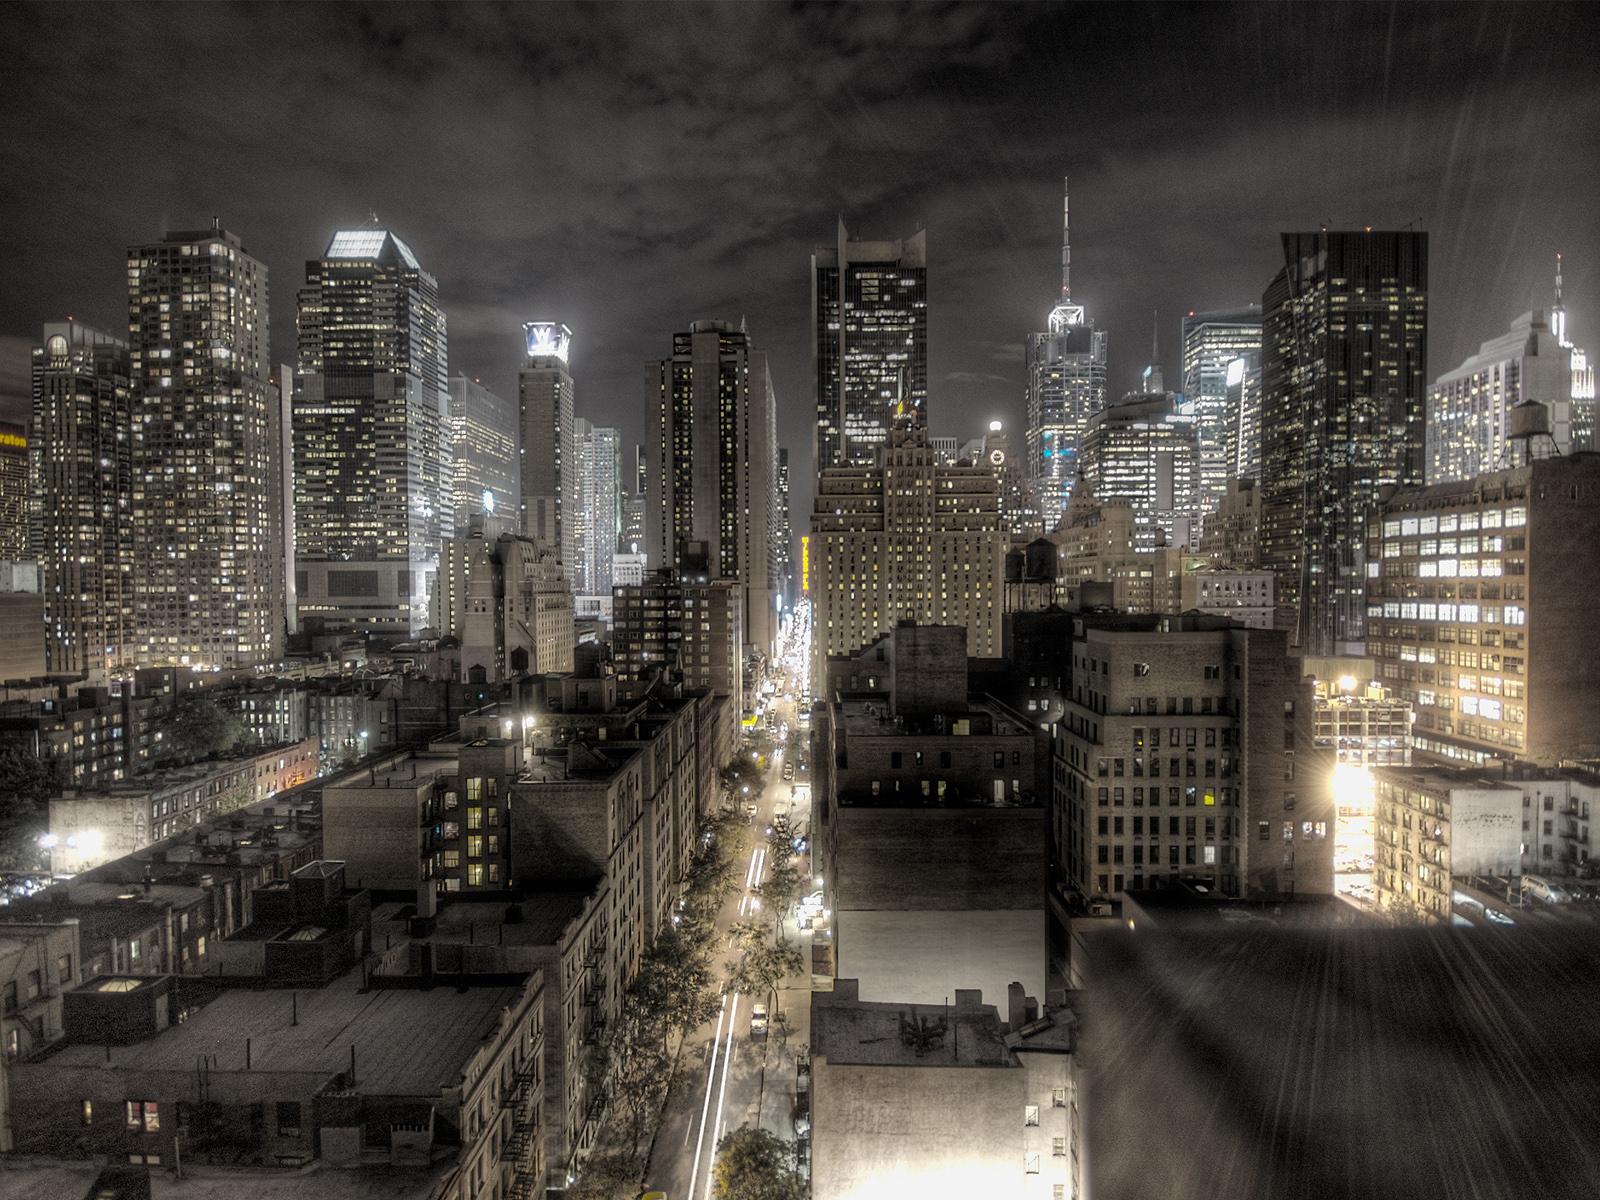 new york city wallpapers 7226 1600x1200jpg 1600x1200